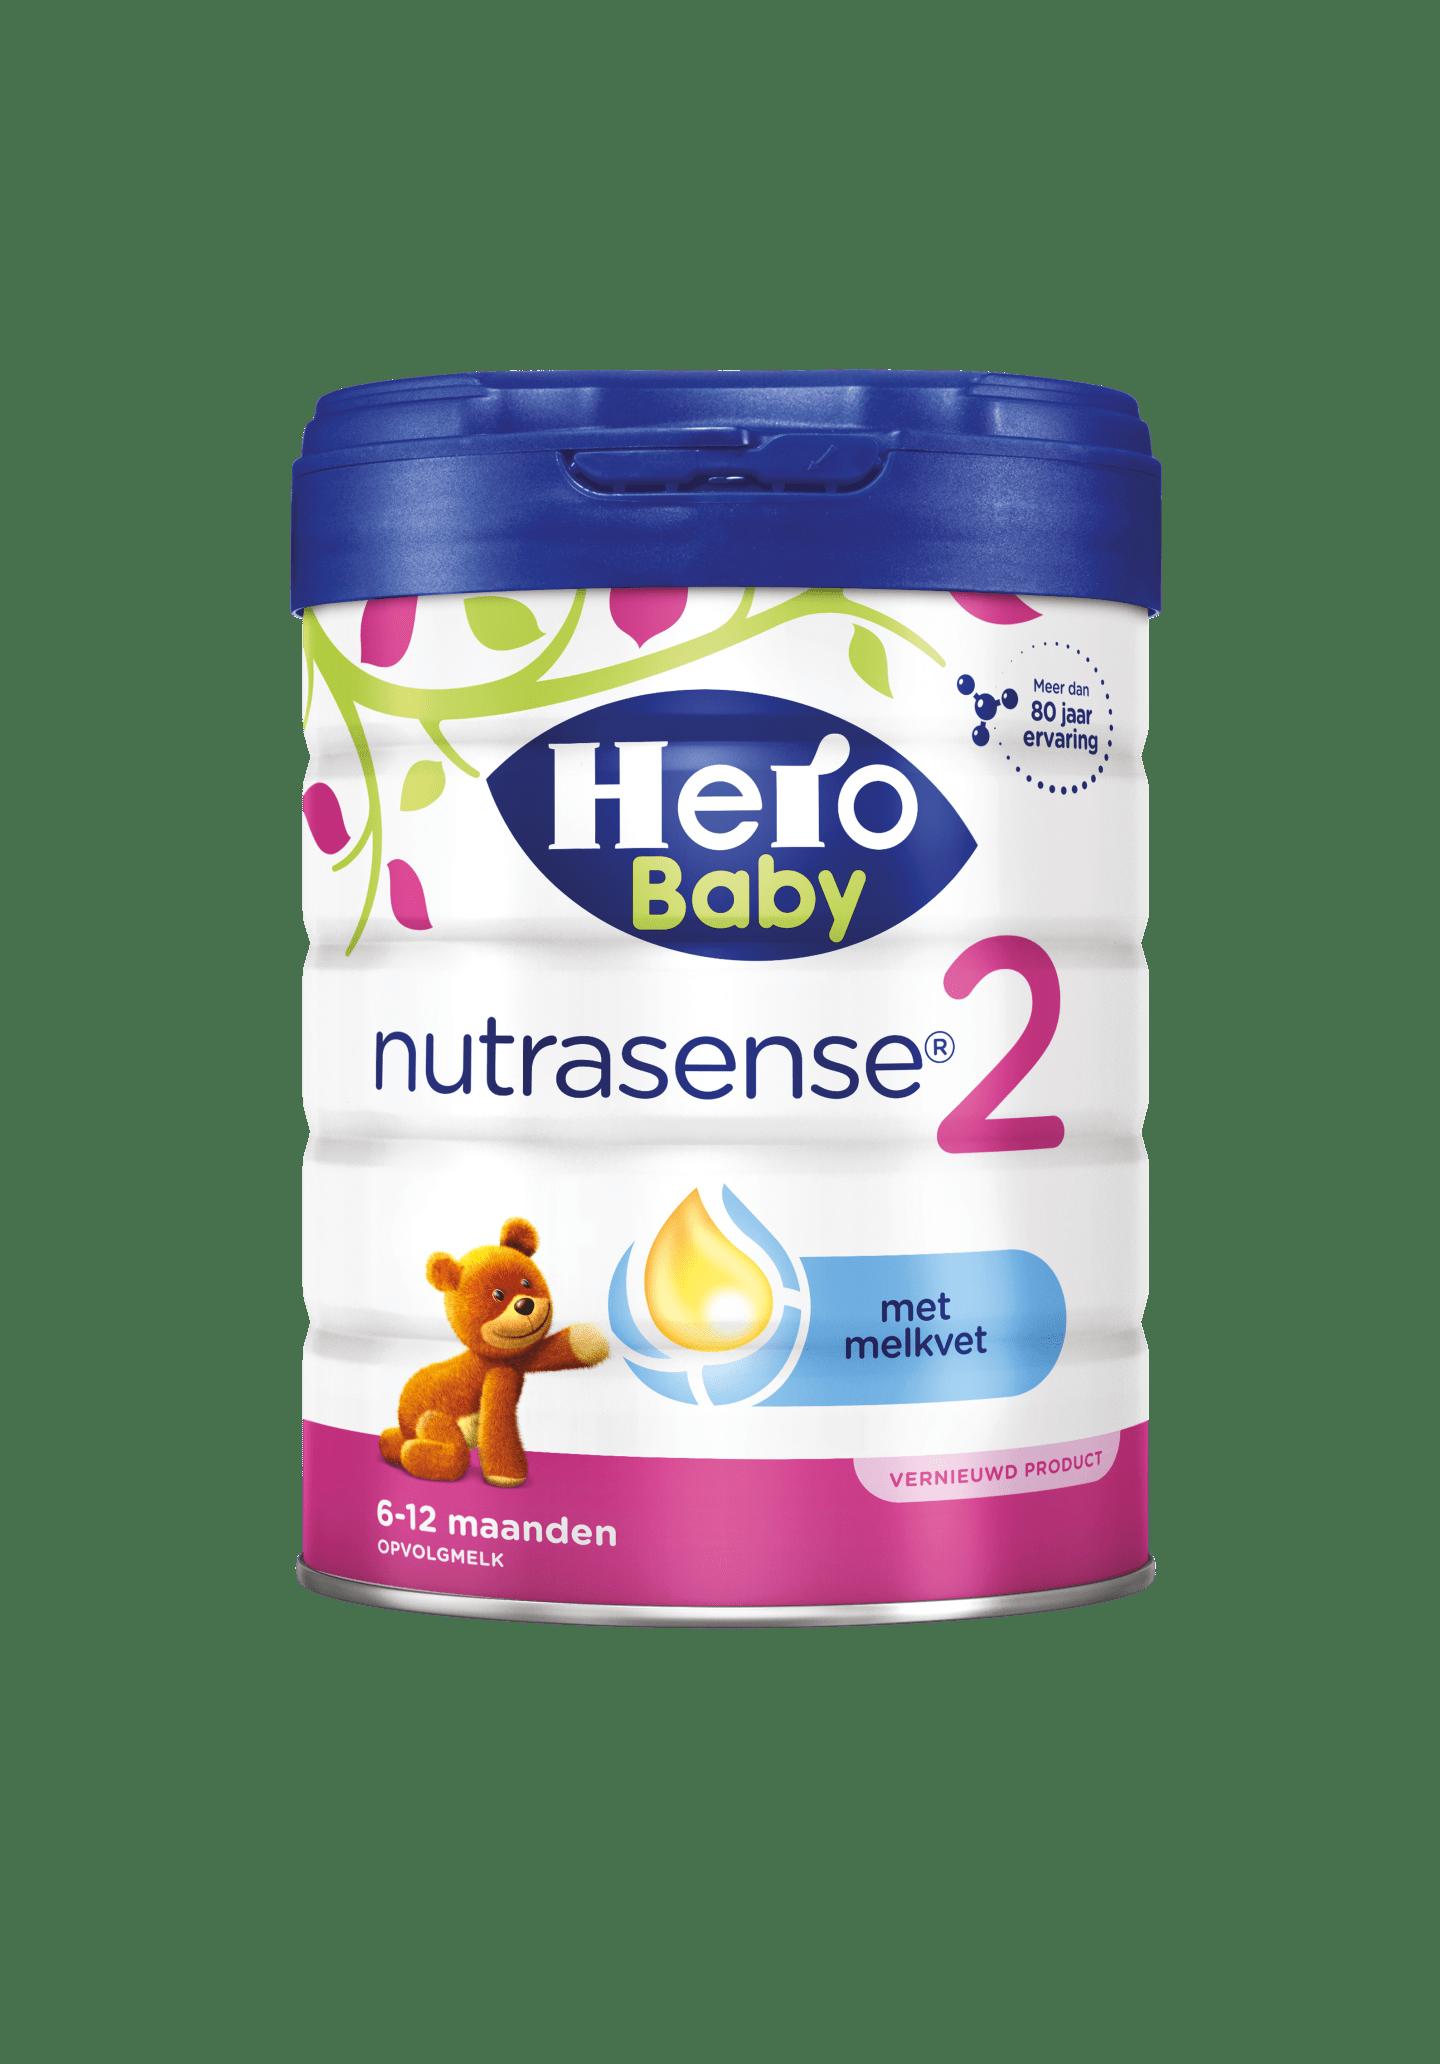 Hero Baby Nutrasense 2